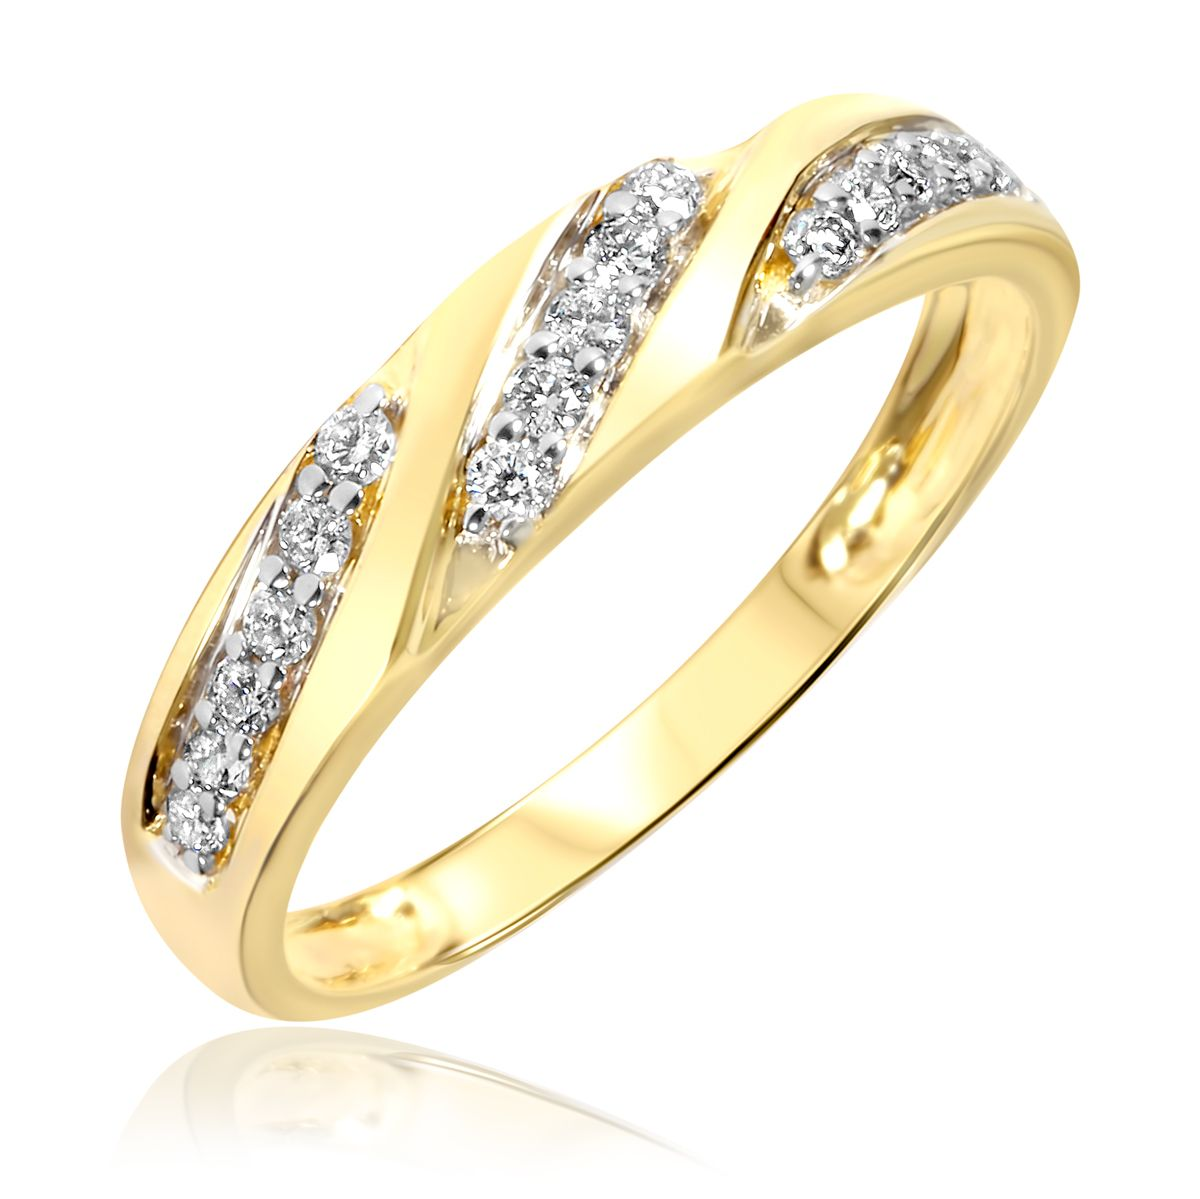 1/4 Carat T.W. Diamond Women's Wedding Ring 14K Yellow ...